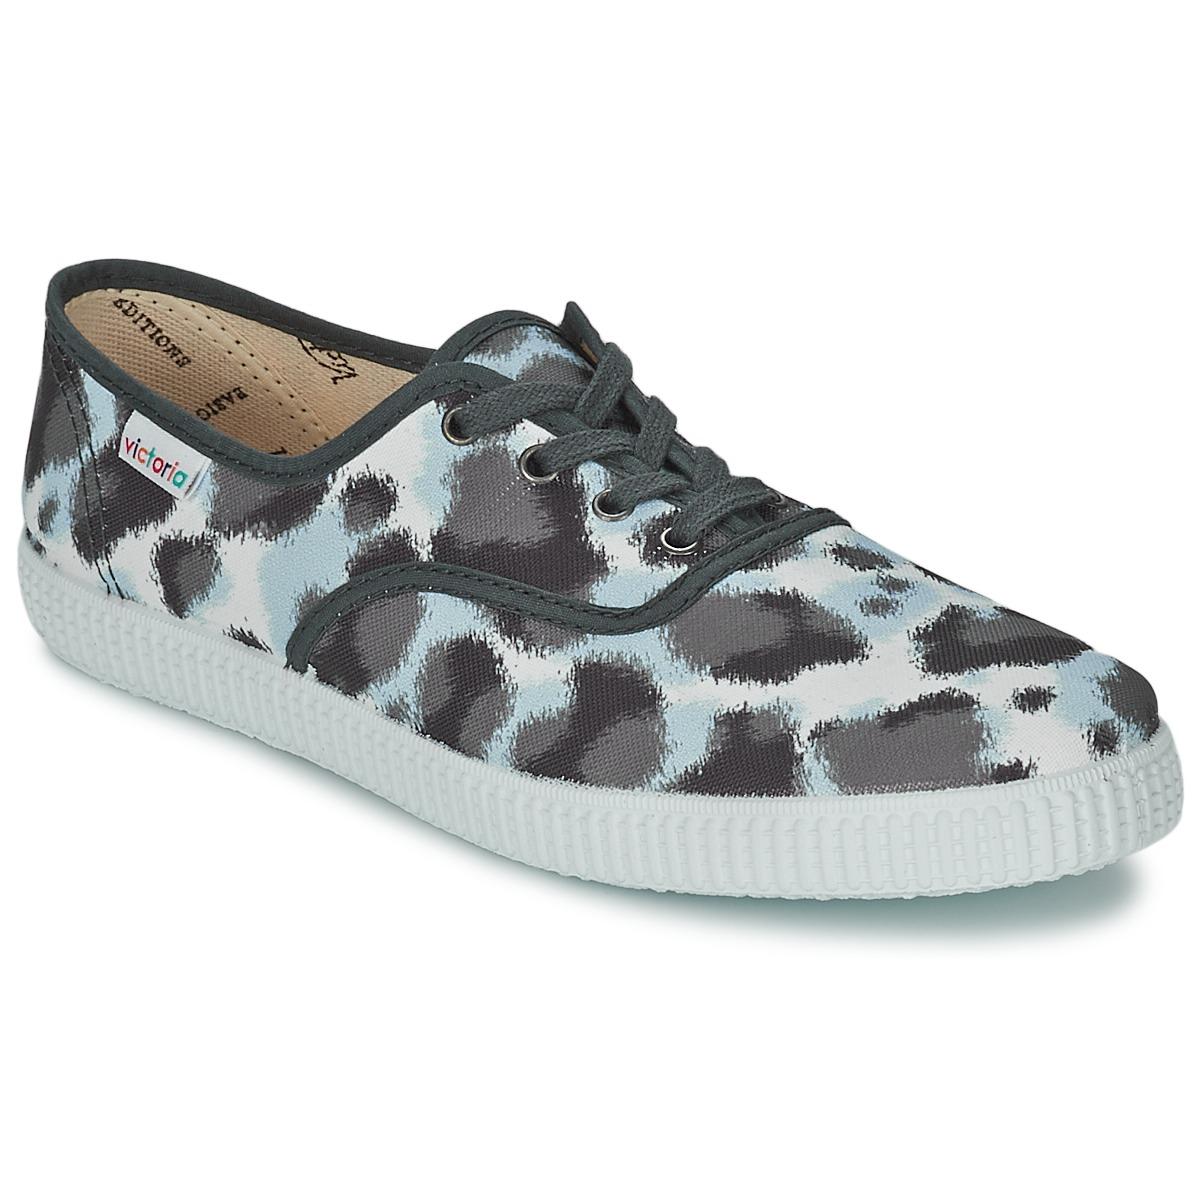 Victoria INGLESA ESTAMP HUELLA TIGRE Grau - Kostenloser Versand bei Spartoode ! - Schuhe Sneaker Low Damen 18,00 €